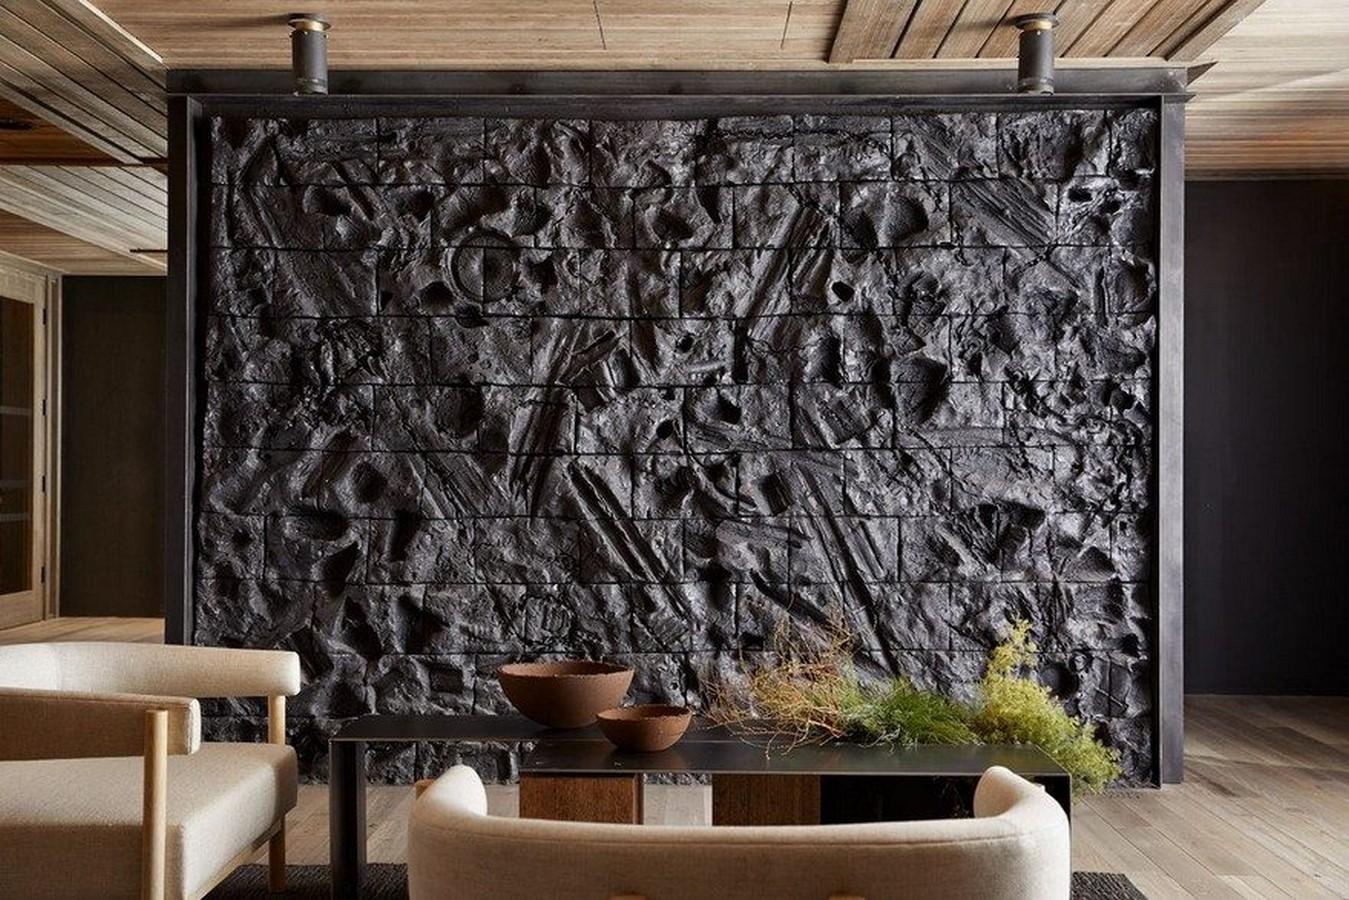 Rethinking the design of hospitality interiors - Sheet4